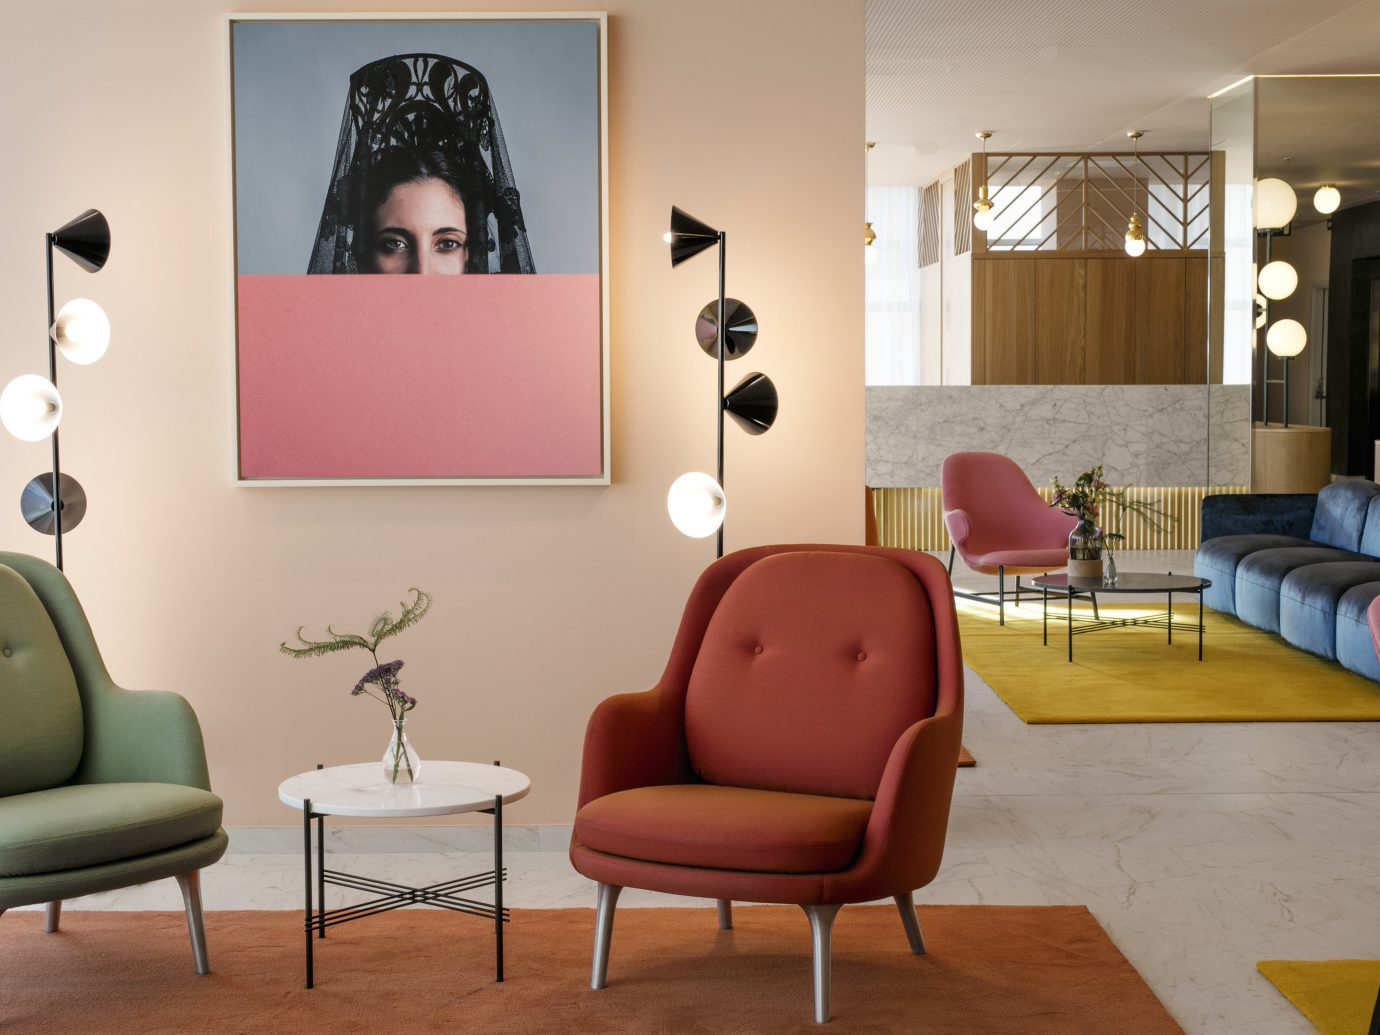 Hotels Madrid Spain wall indoor floor room furniture interior design Living living room chair table couch home waiting room interior designer flooring lamp area